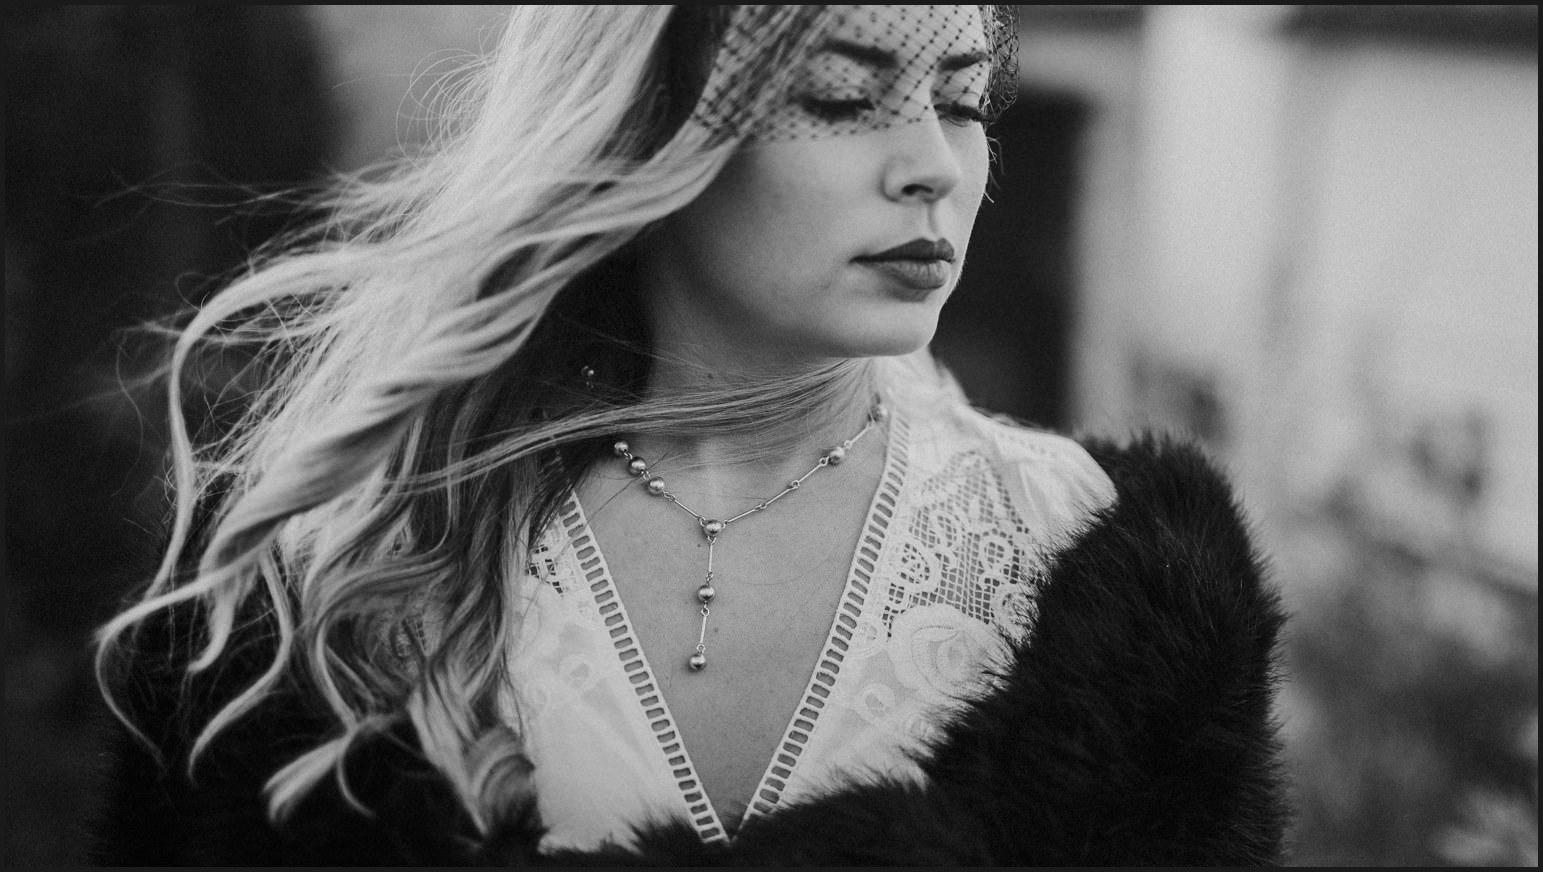 bride, black and white, portrait, wind, hair